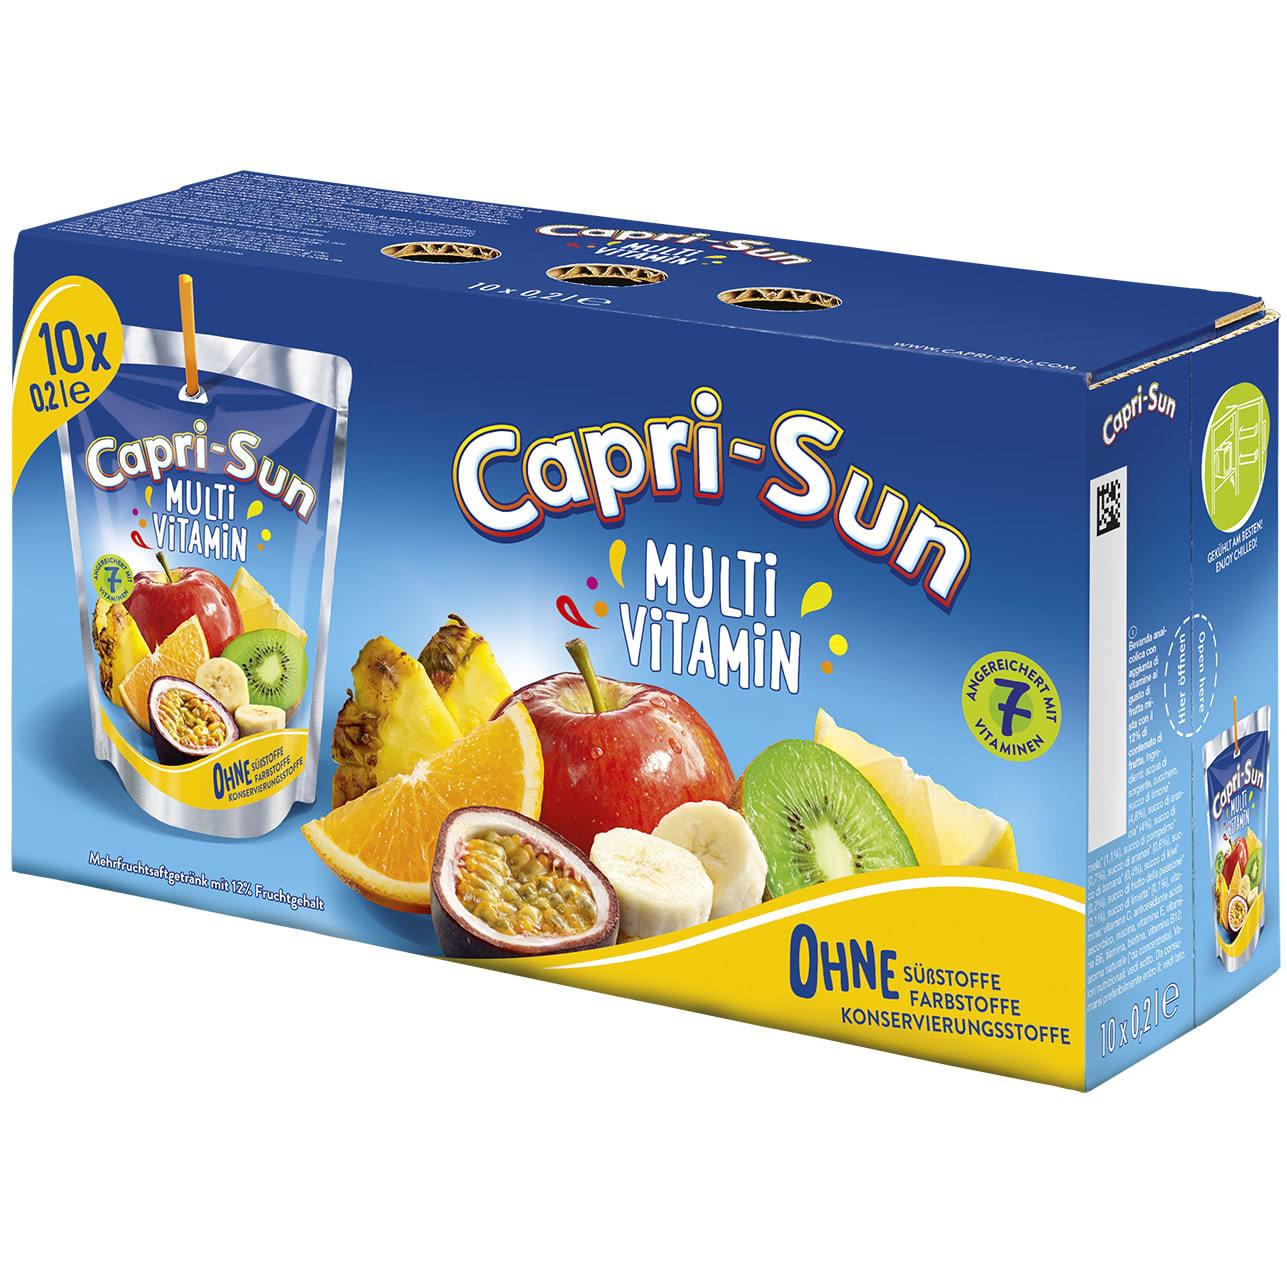 Capri-Son Capri-Sun - Multivitamin 200ml 10-Pack